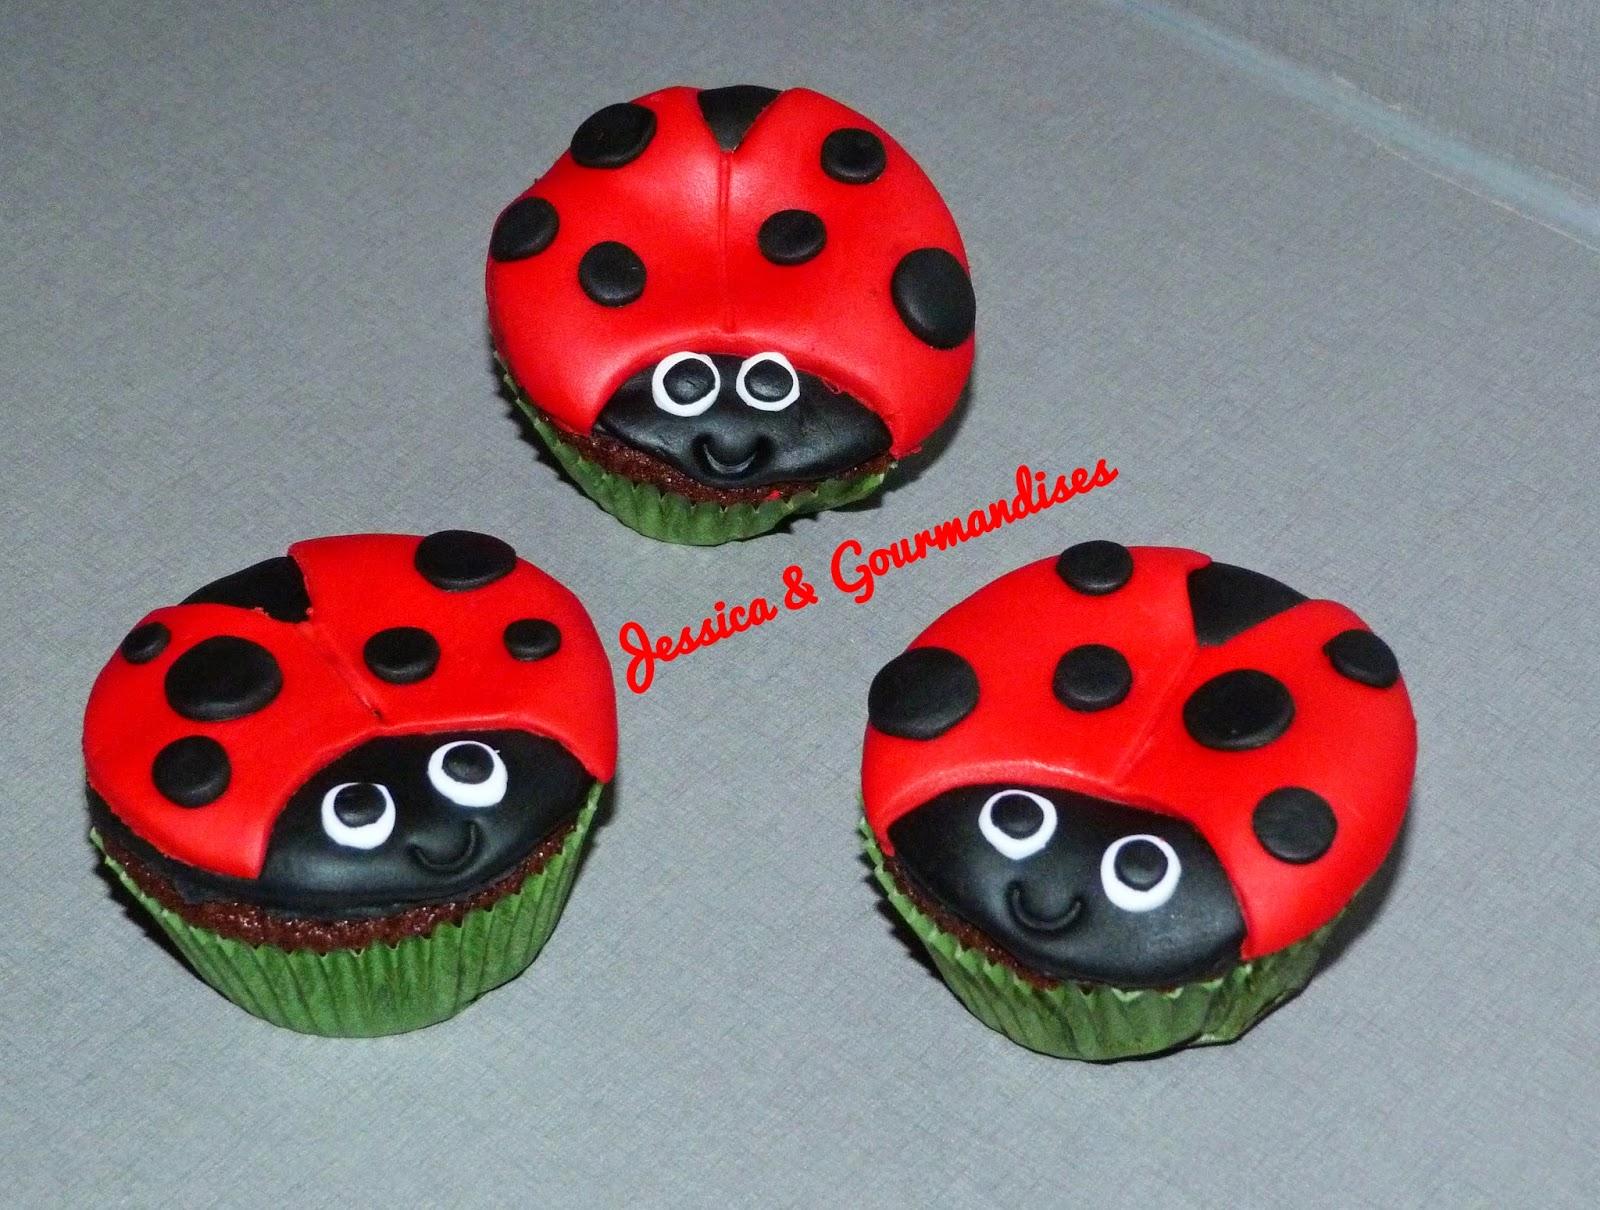 Extrêmement Jessica & Gourmandises: Cupcake coccinelle UY99